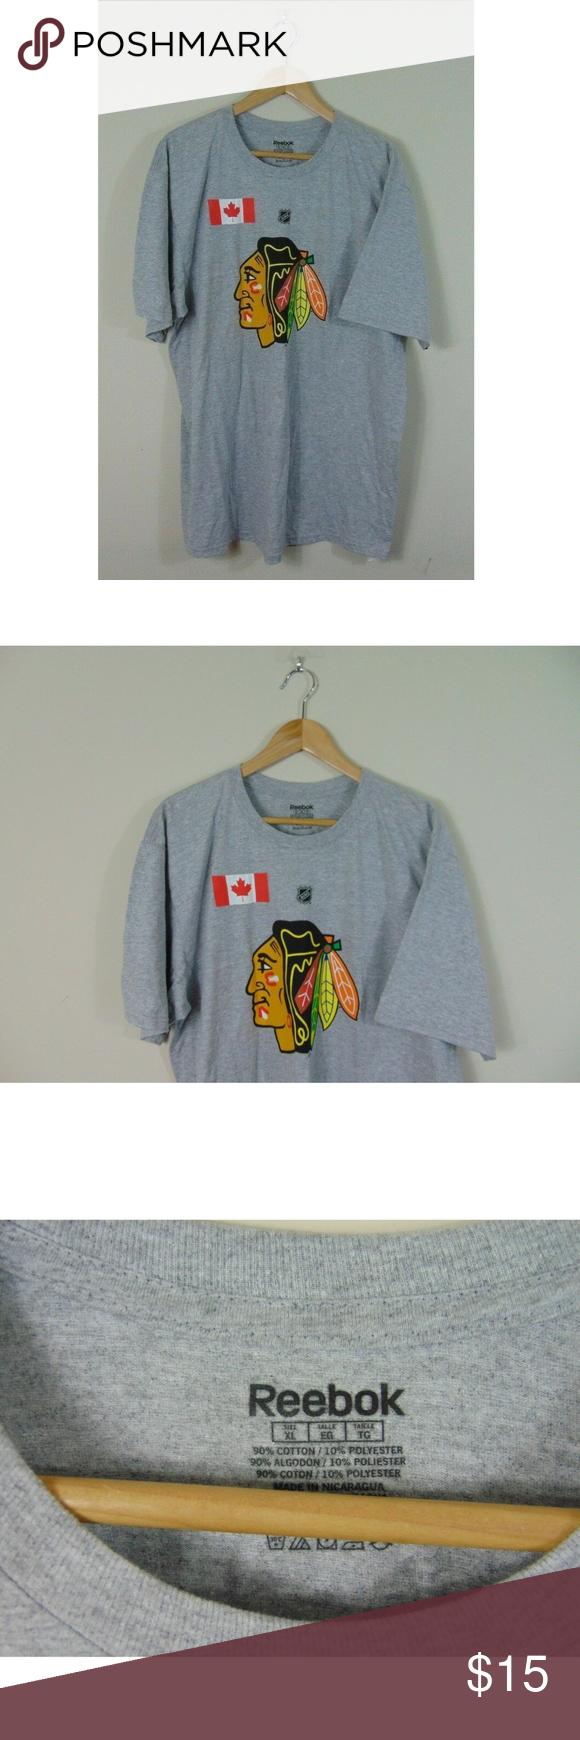 0a559fb9221 Reebok Men XL Chicago Gray Short Sleeve NHL Shirt Reebok Men's XL Chicago  Blackhawks Gray Short